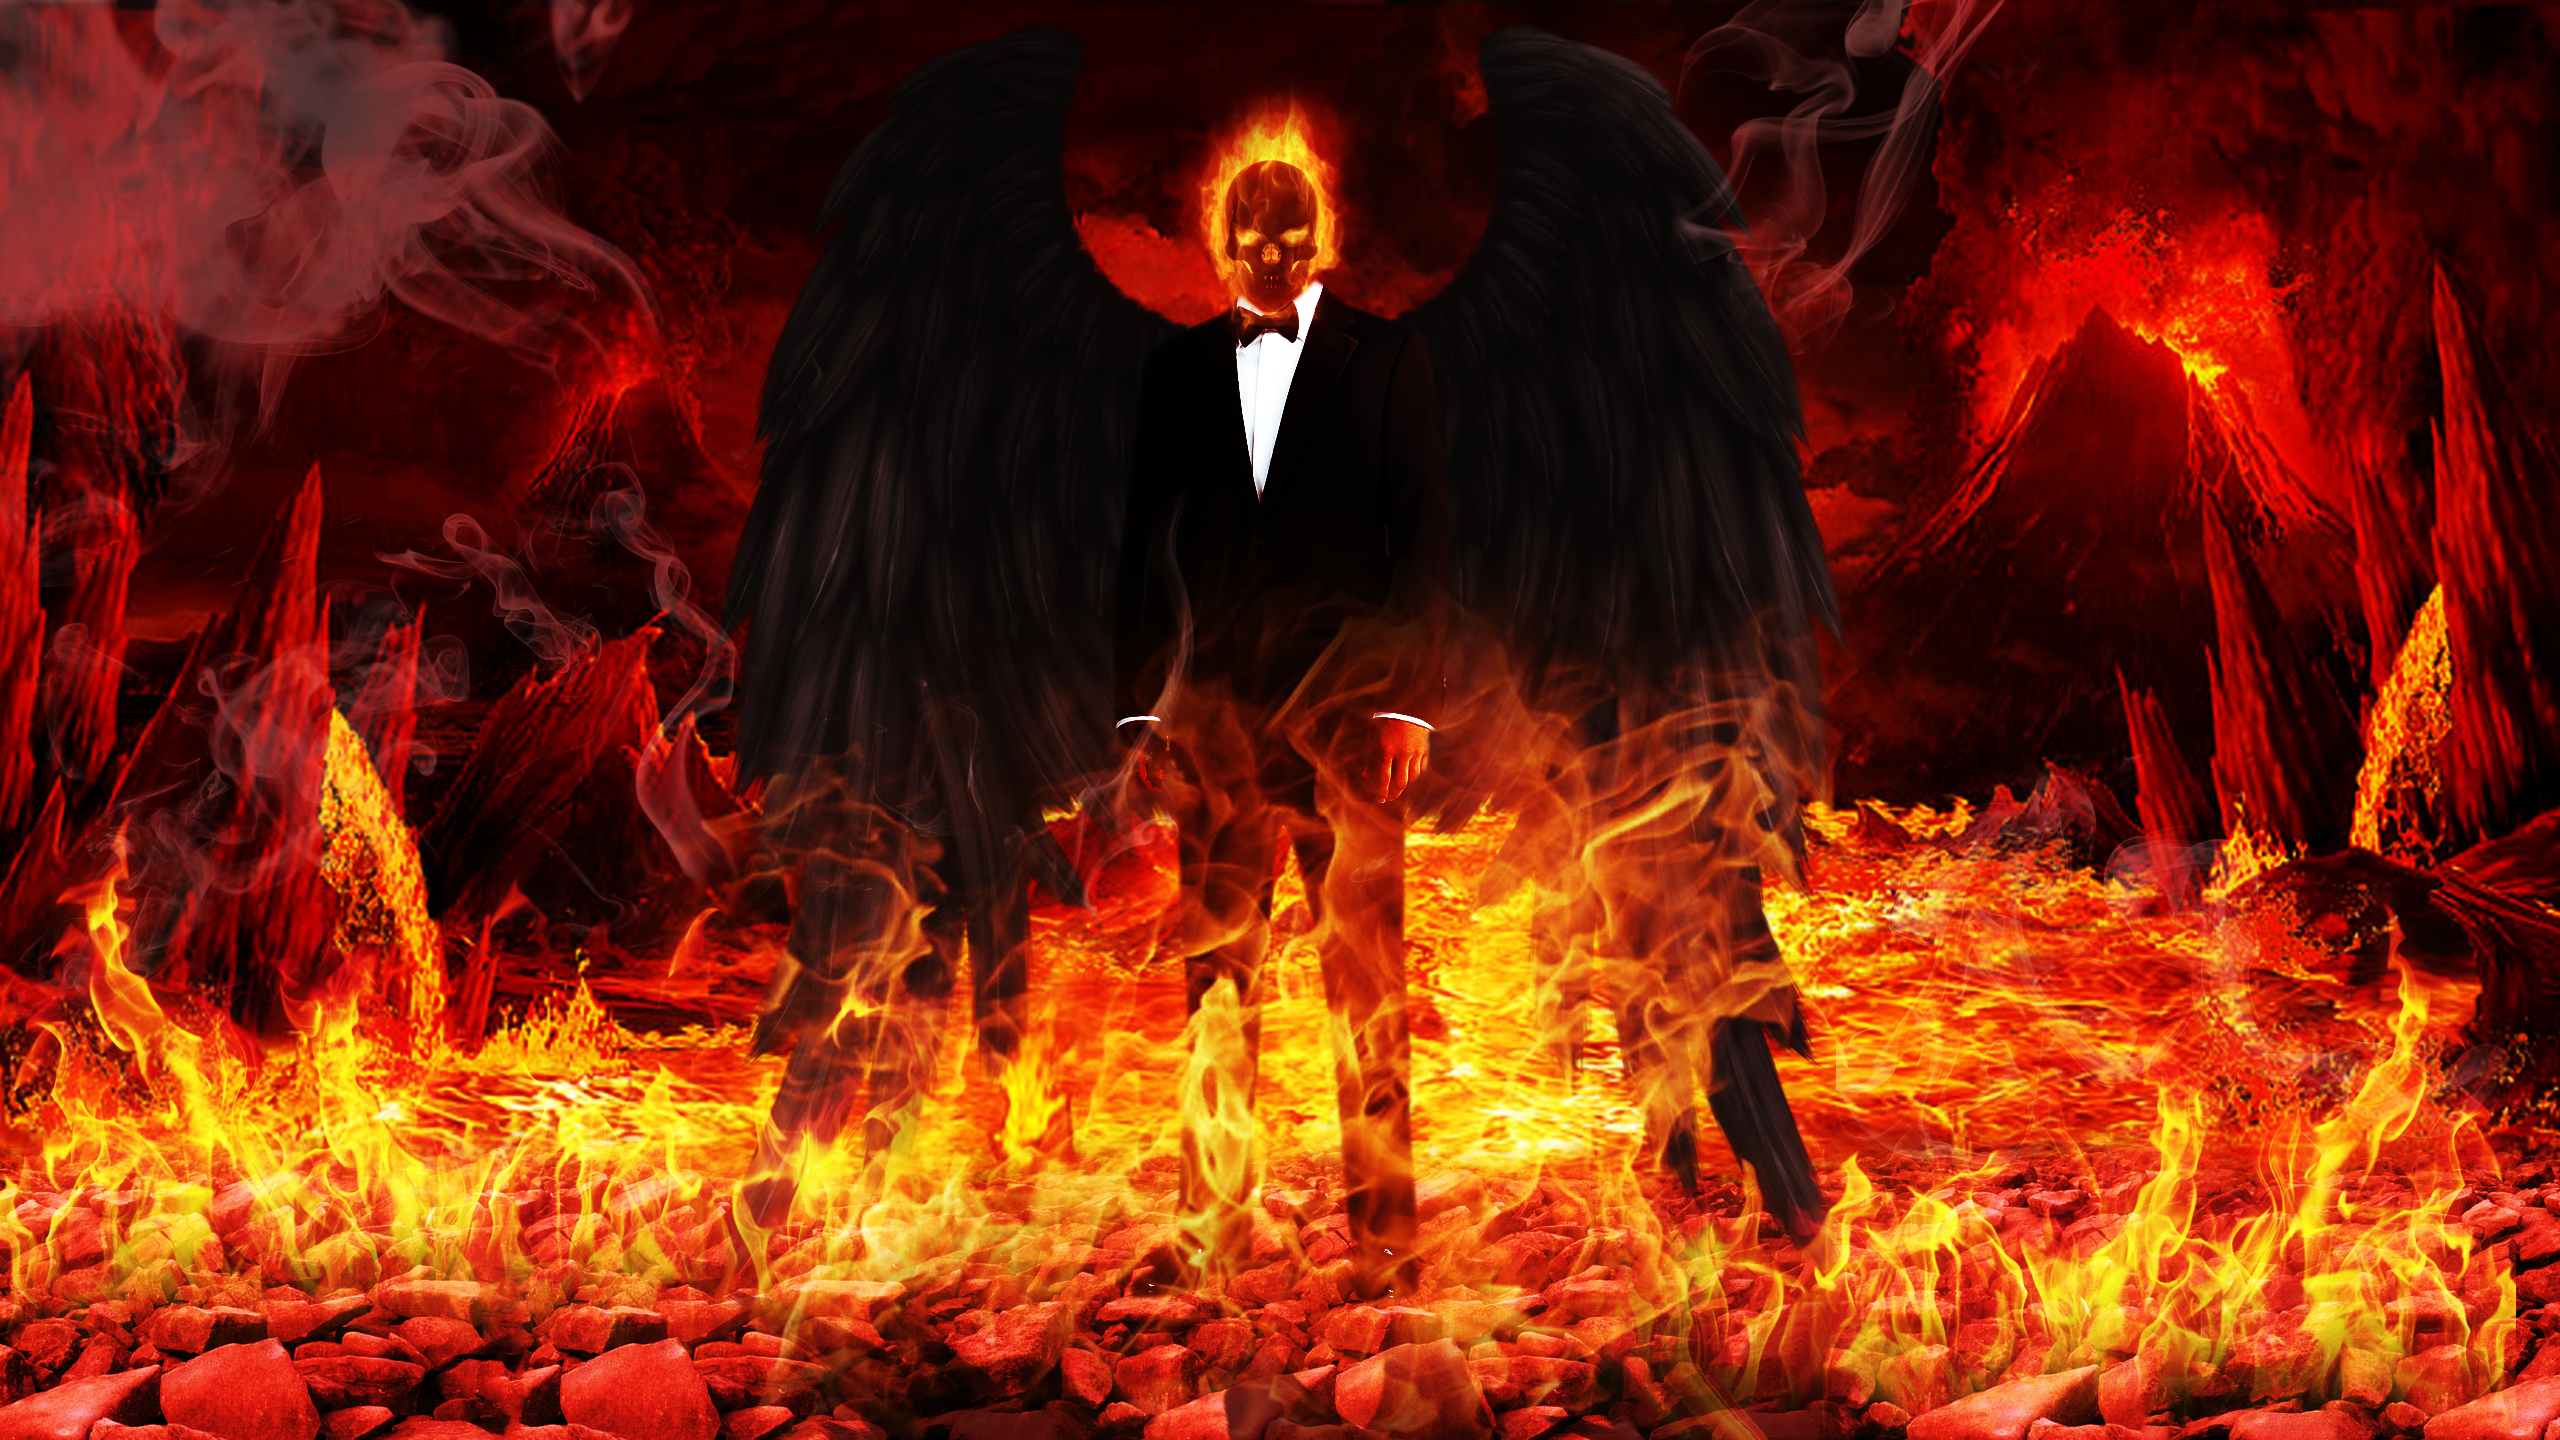 devil demon wallpaper - photo #1